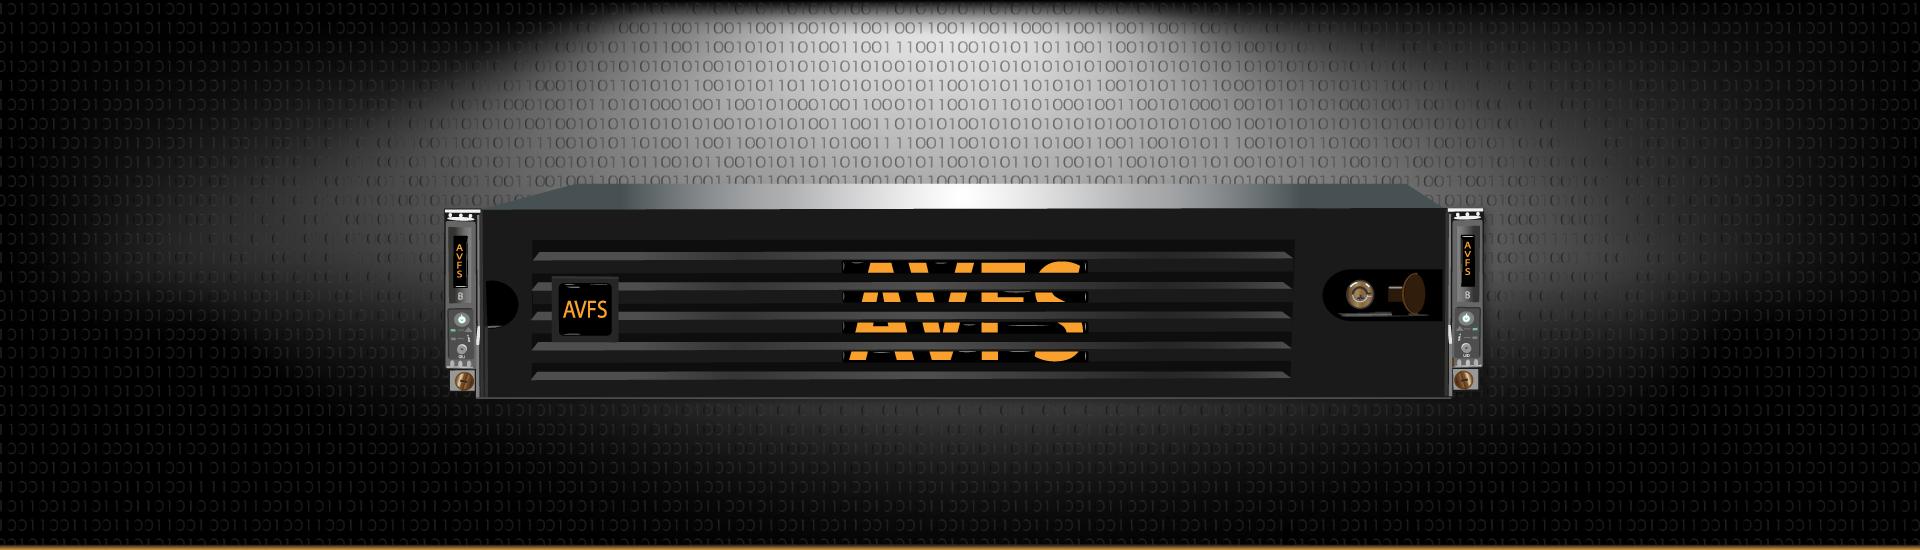 AVFS Header